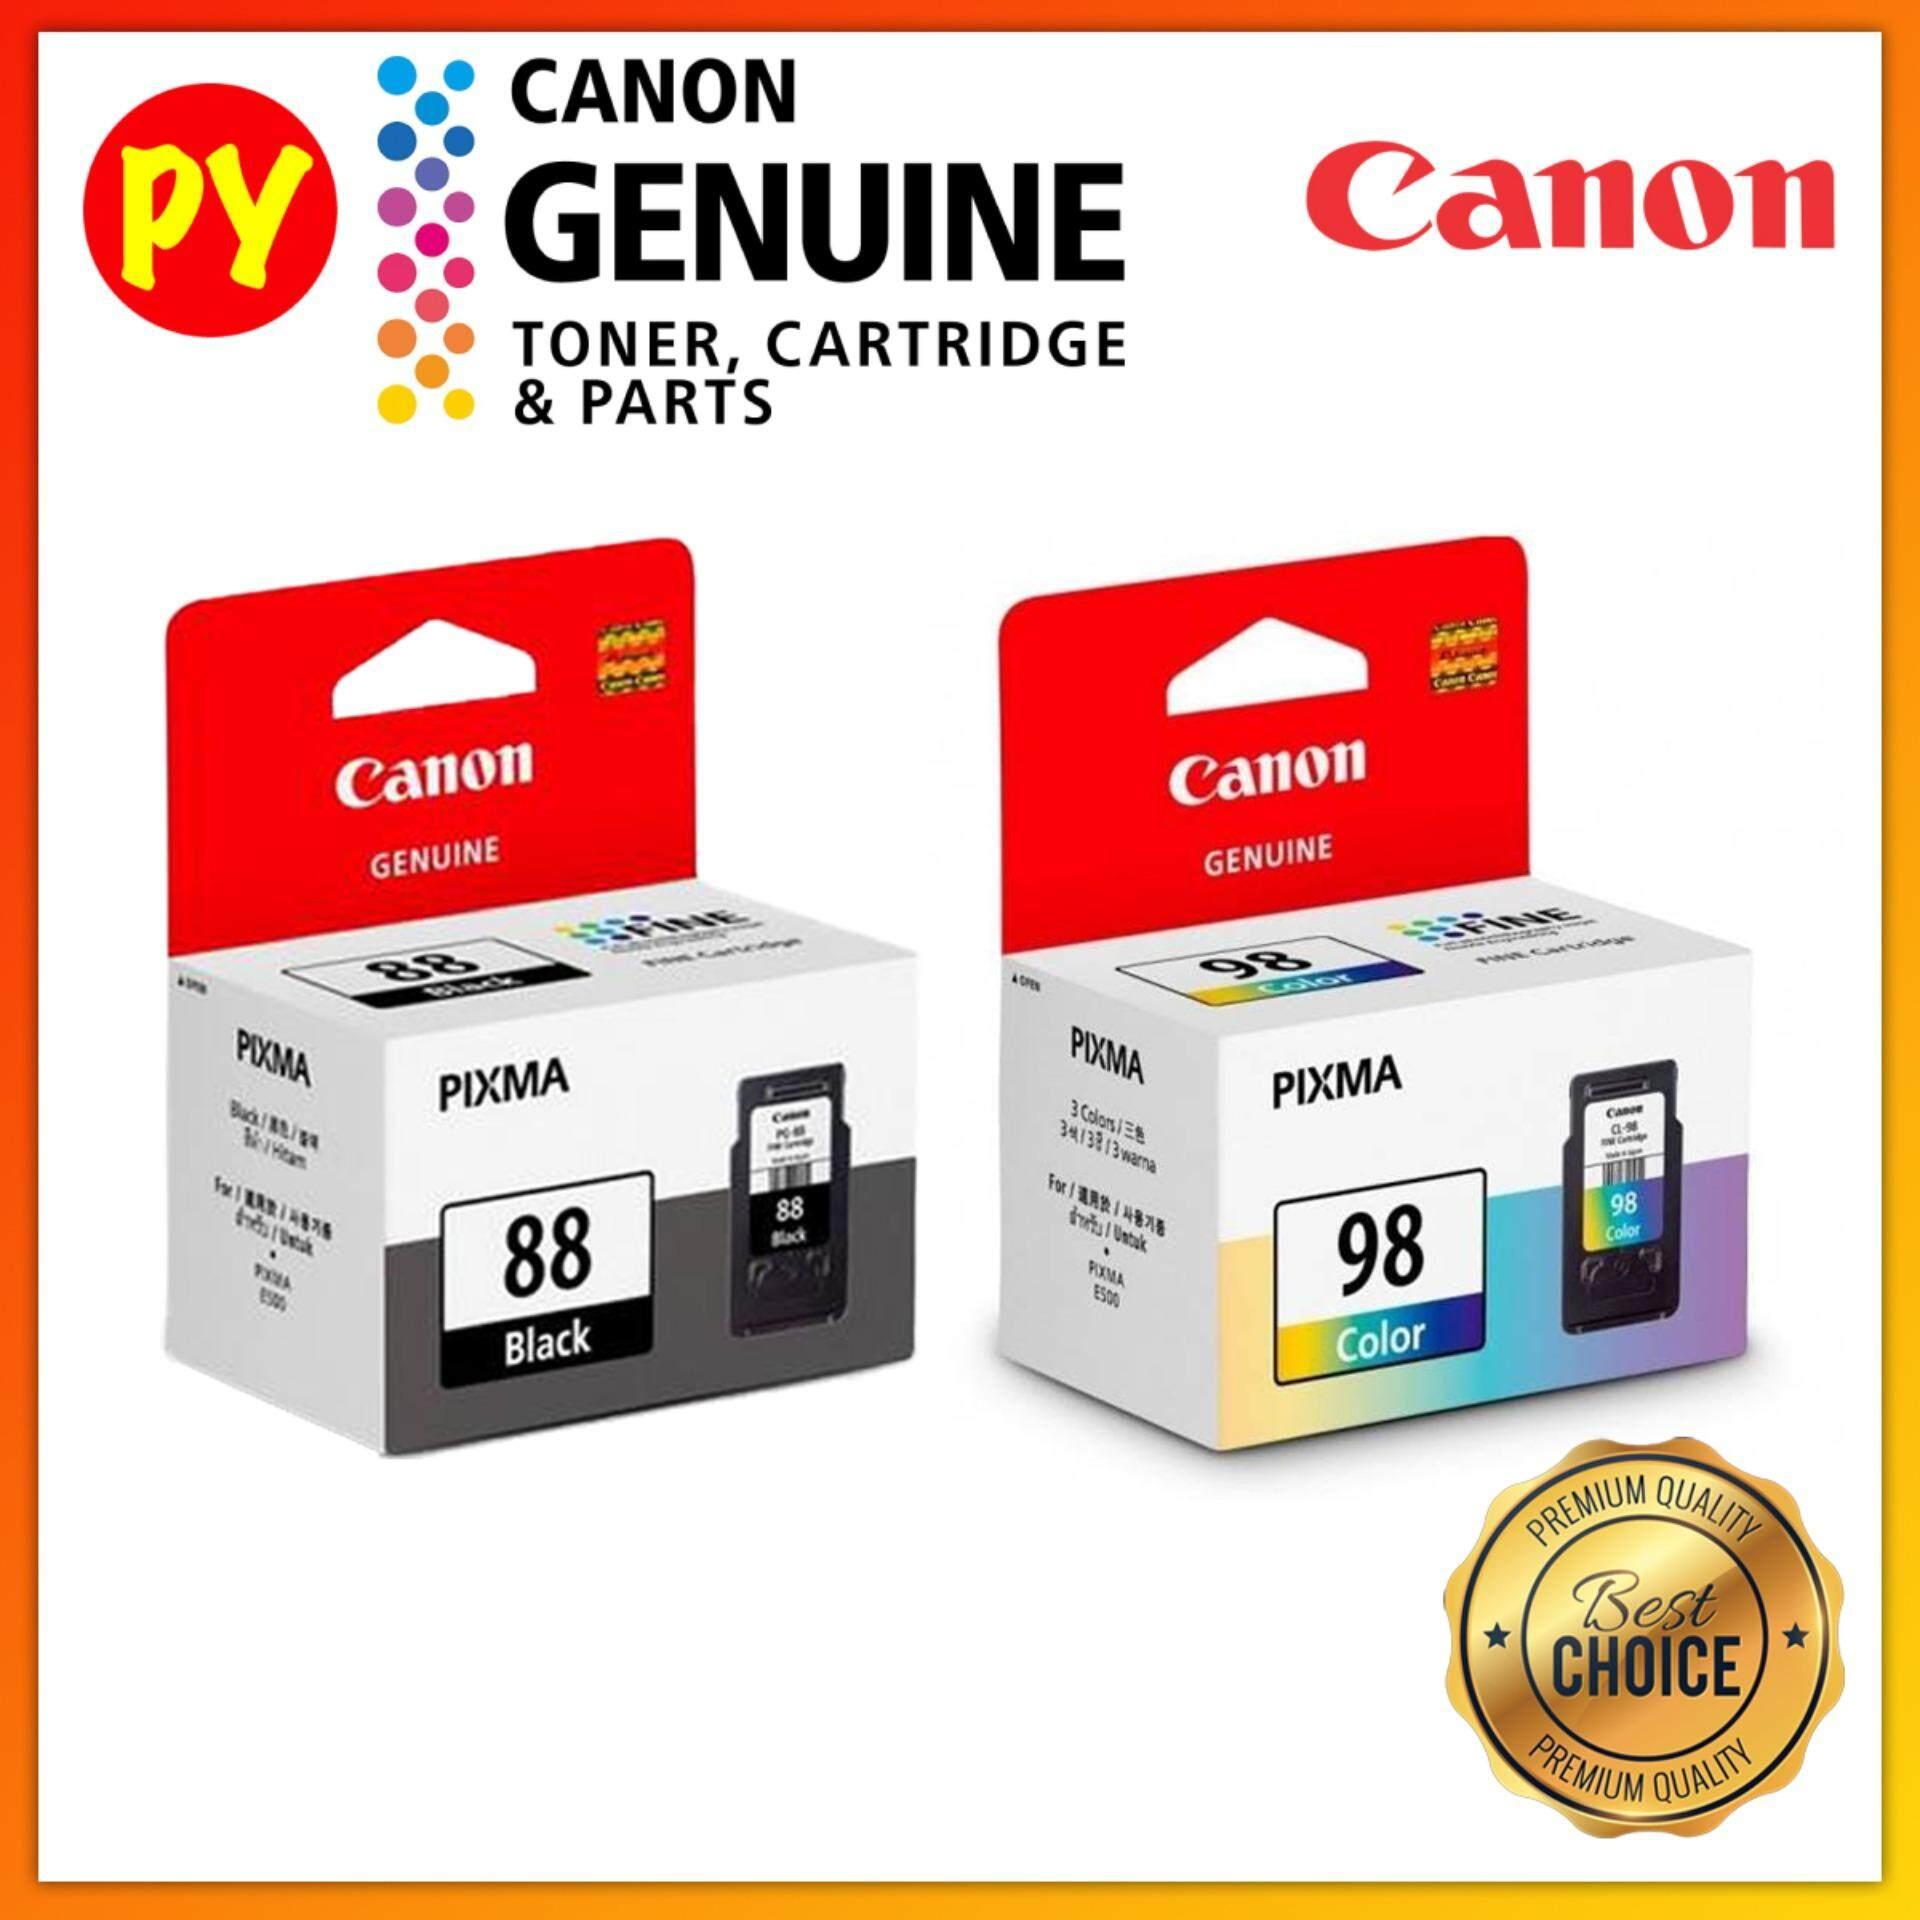 Printers Accessories Buy At Best Price In Hp Deskjet 1112 Printer Putih Canon Pg 88 Black Cl 98 Color Original Ink Cartridge Value Set